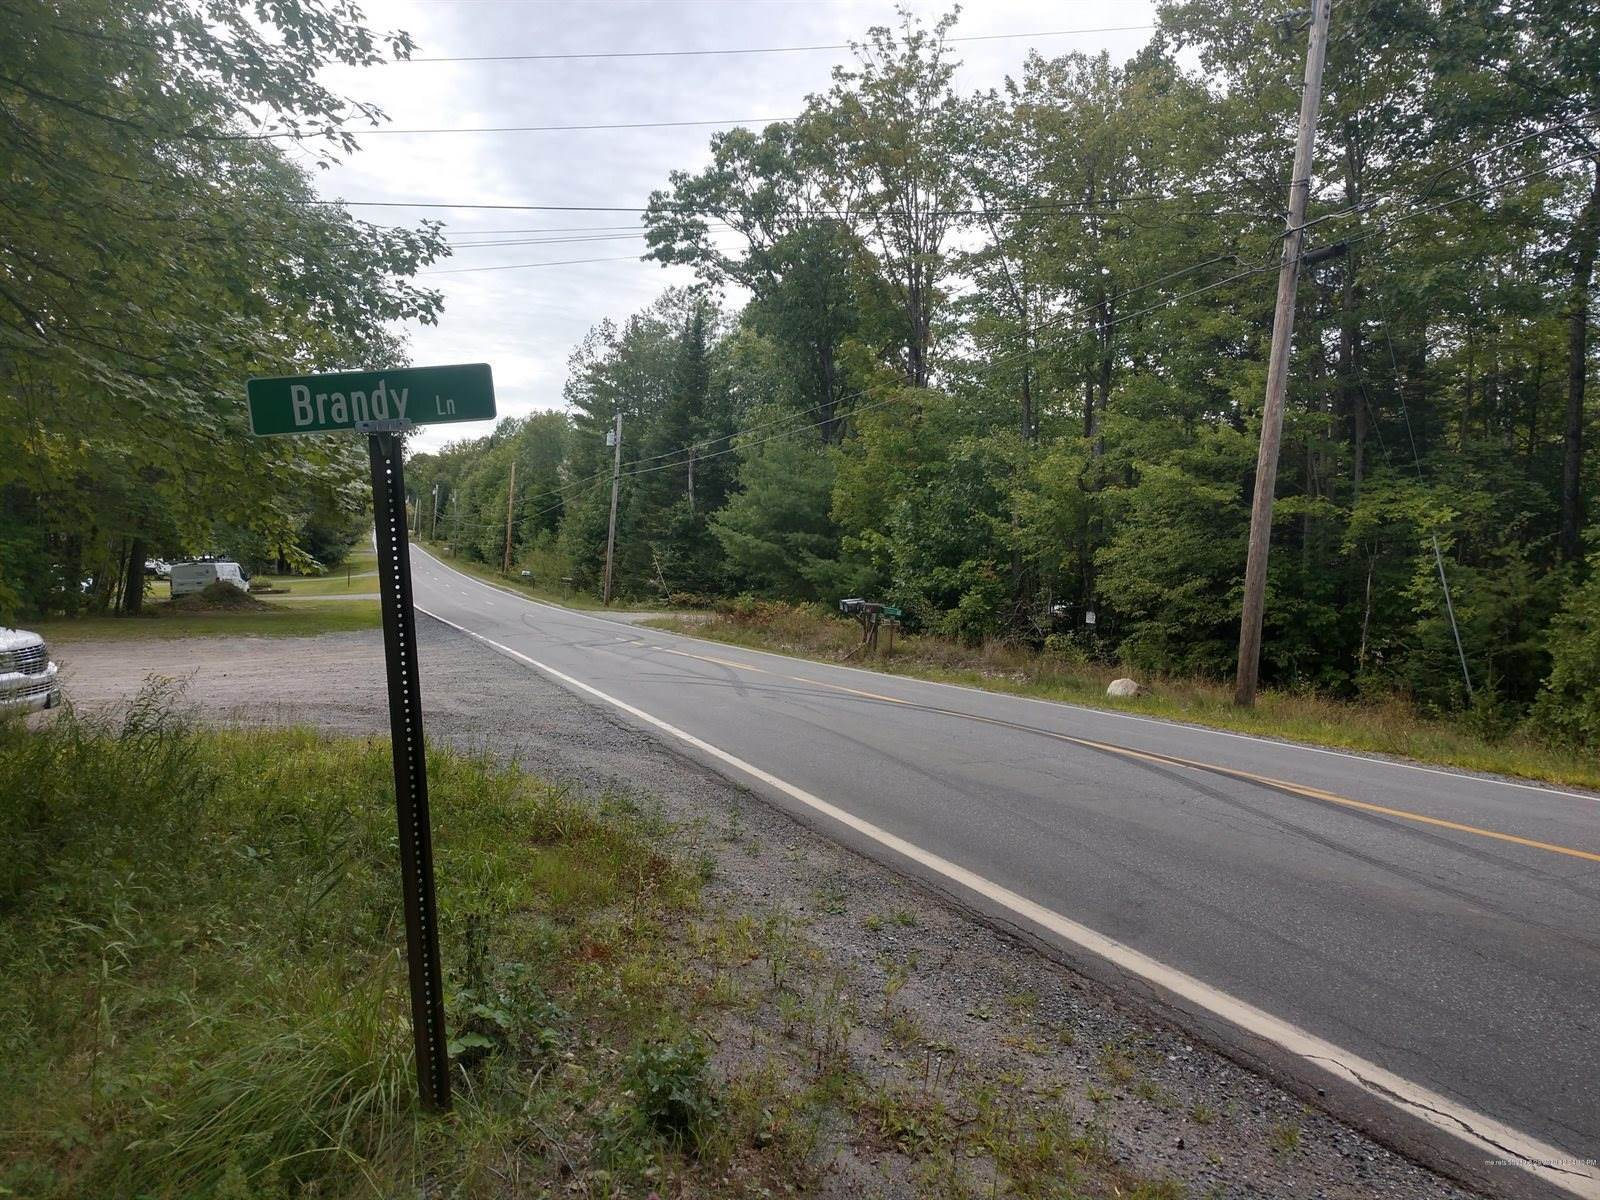 8 Brandy Lane, Burnham, ME 04922